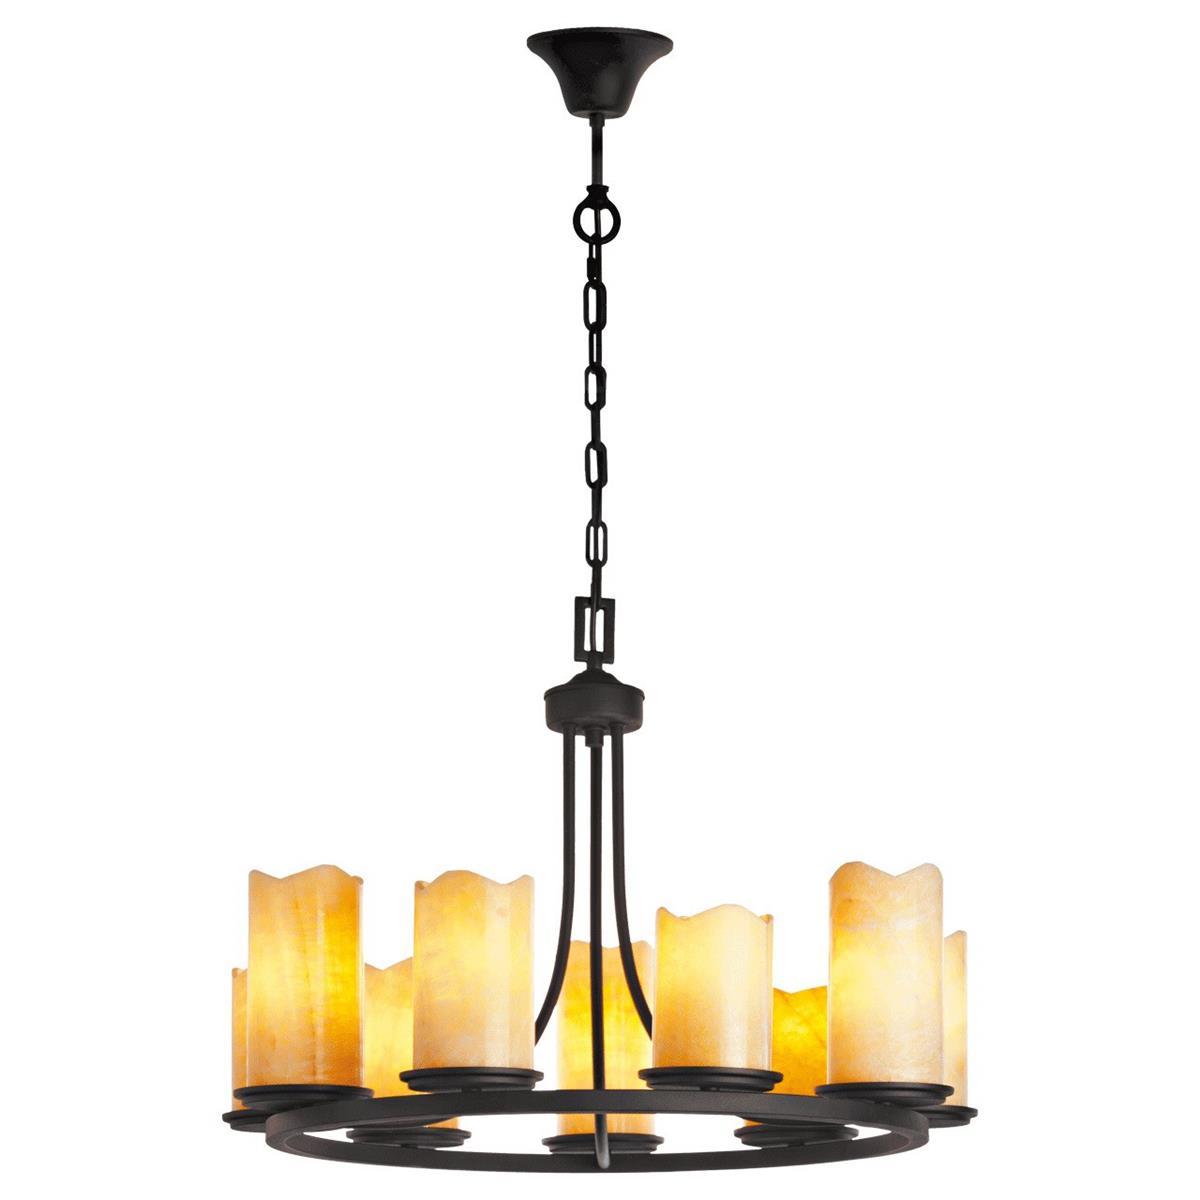 mw light country kronleuchter 382017109 lampenkaufhaus. Black Bedroom Furniture Sets. Home Design Ideas